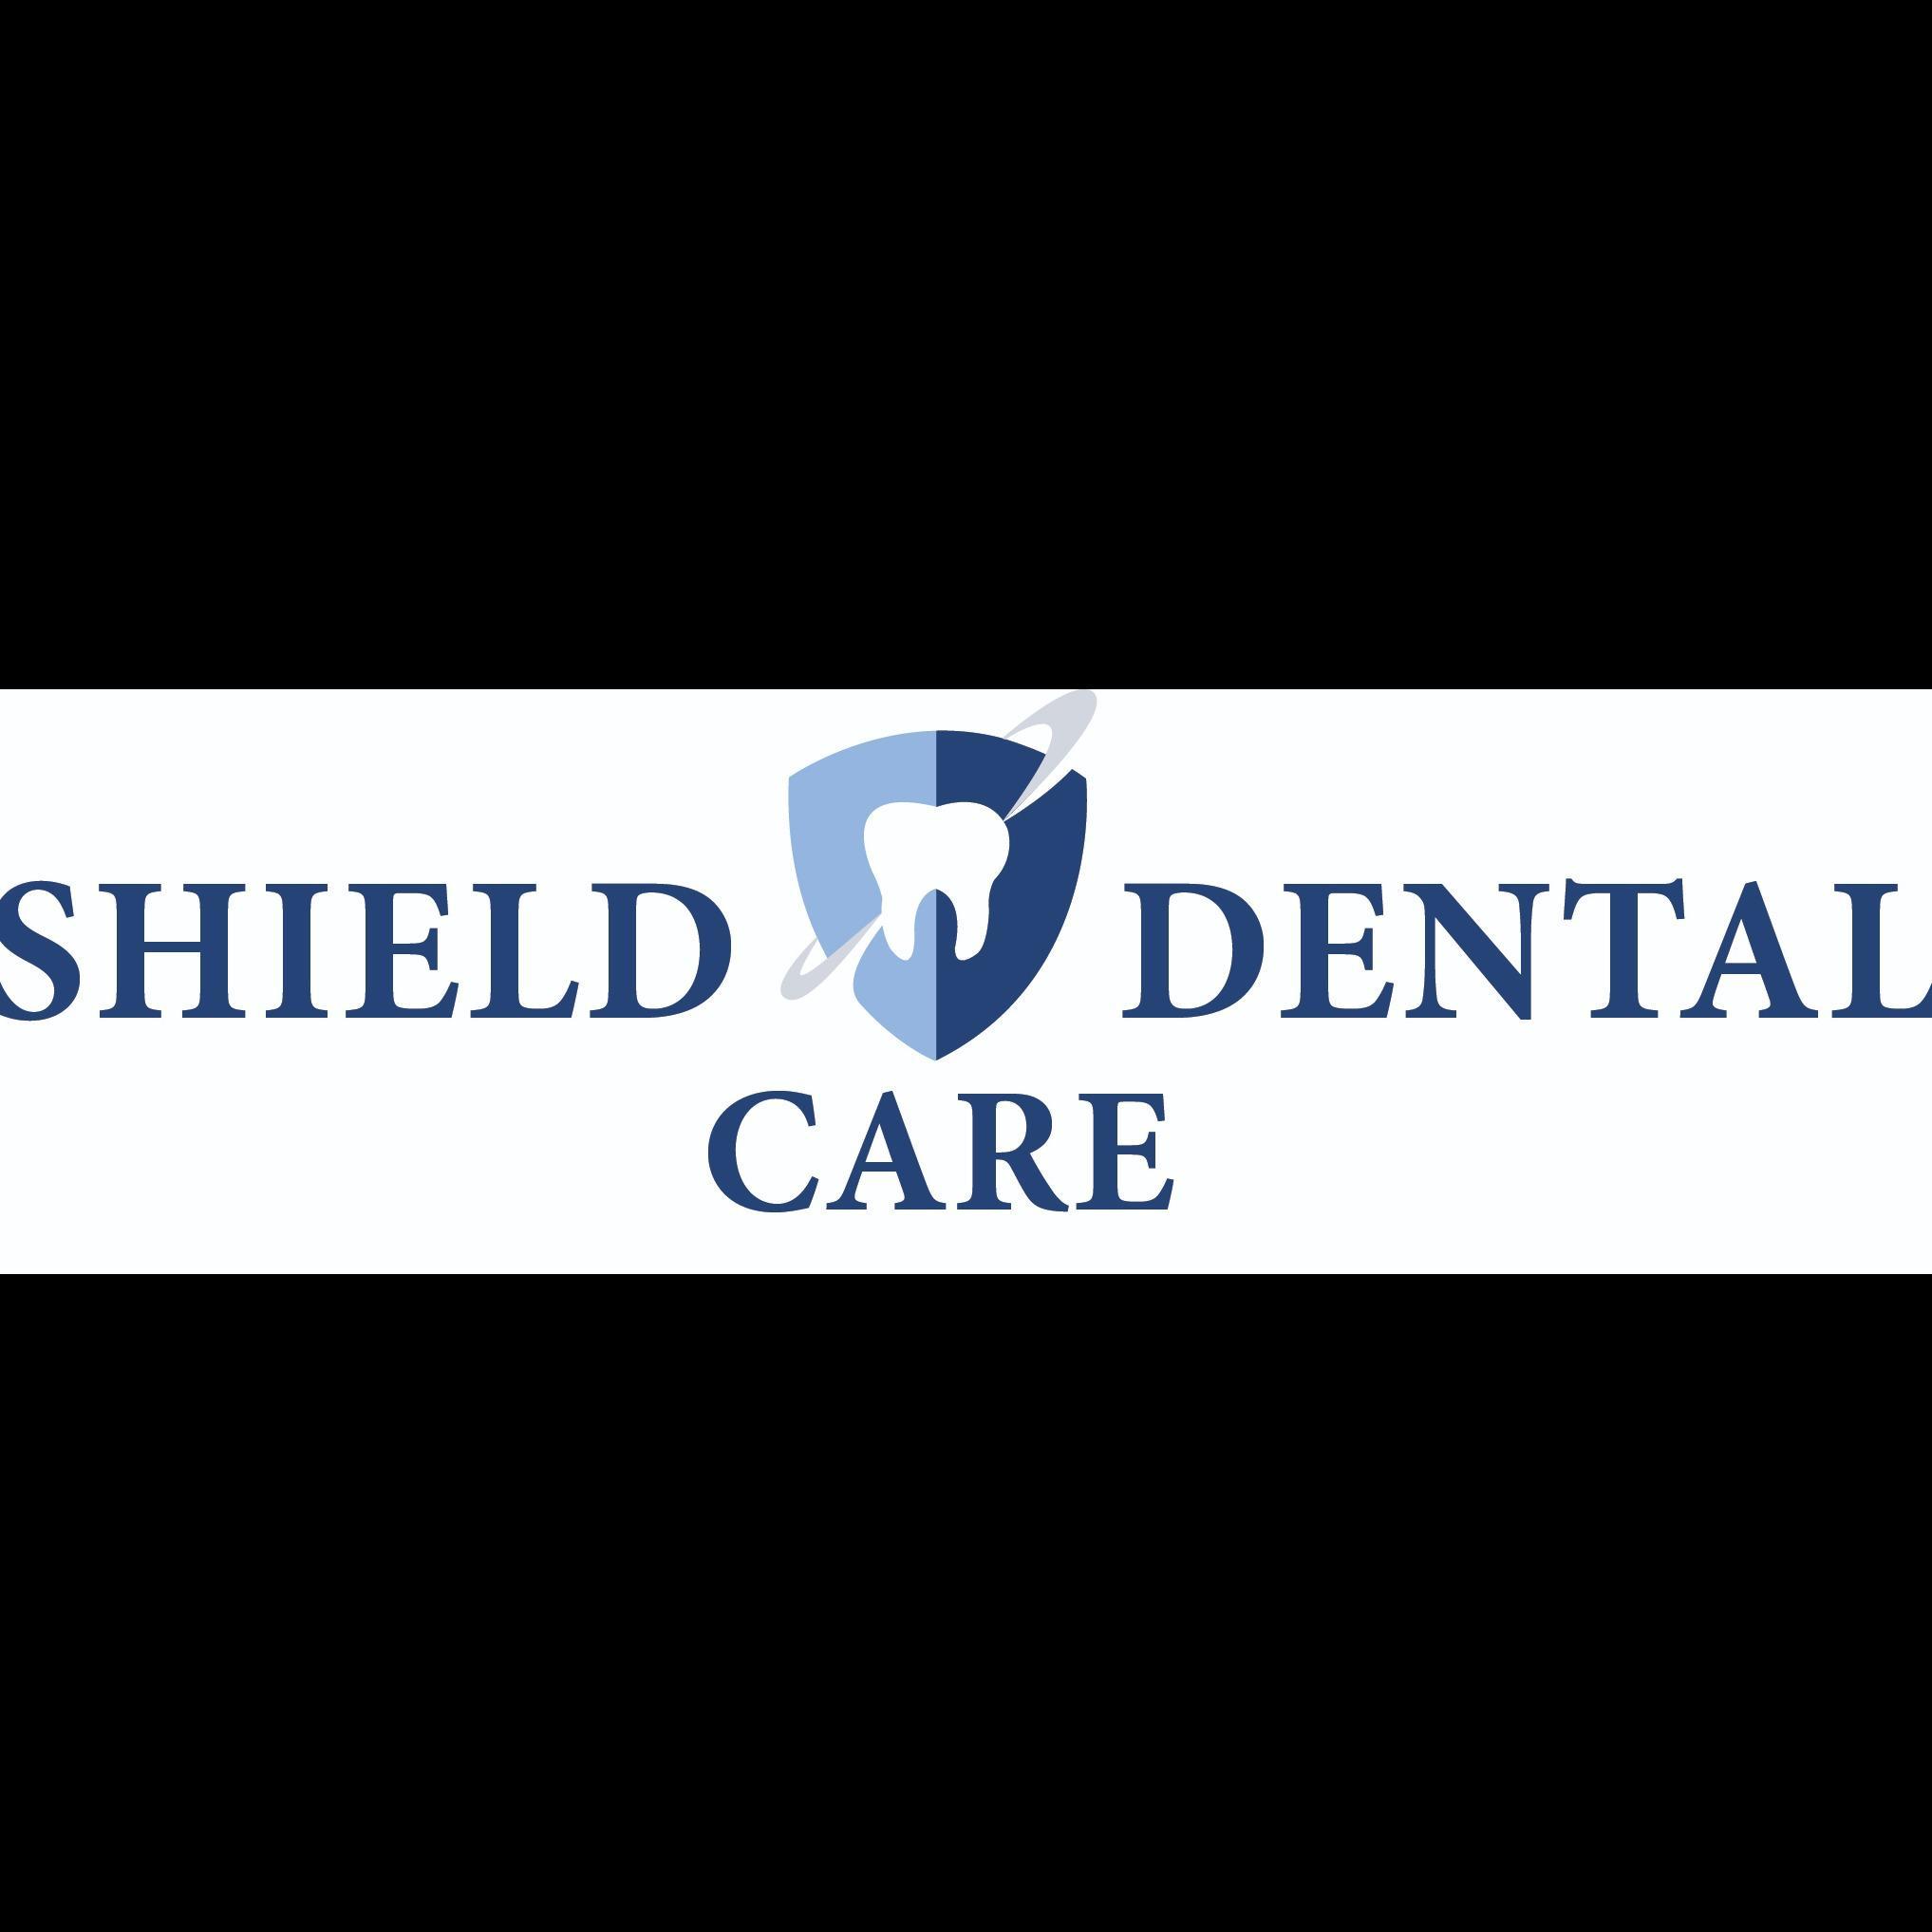 Shield Dental Care